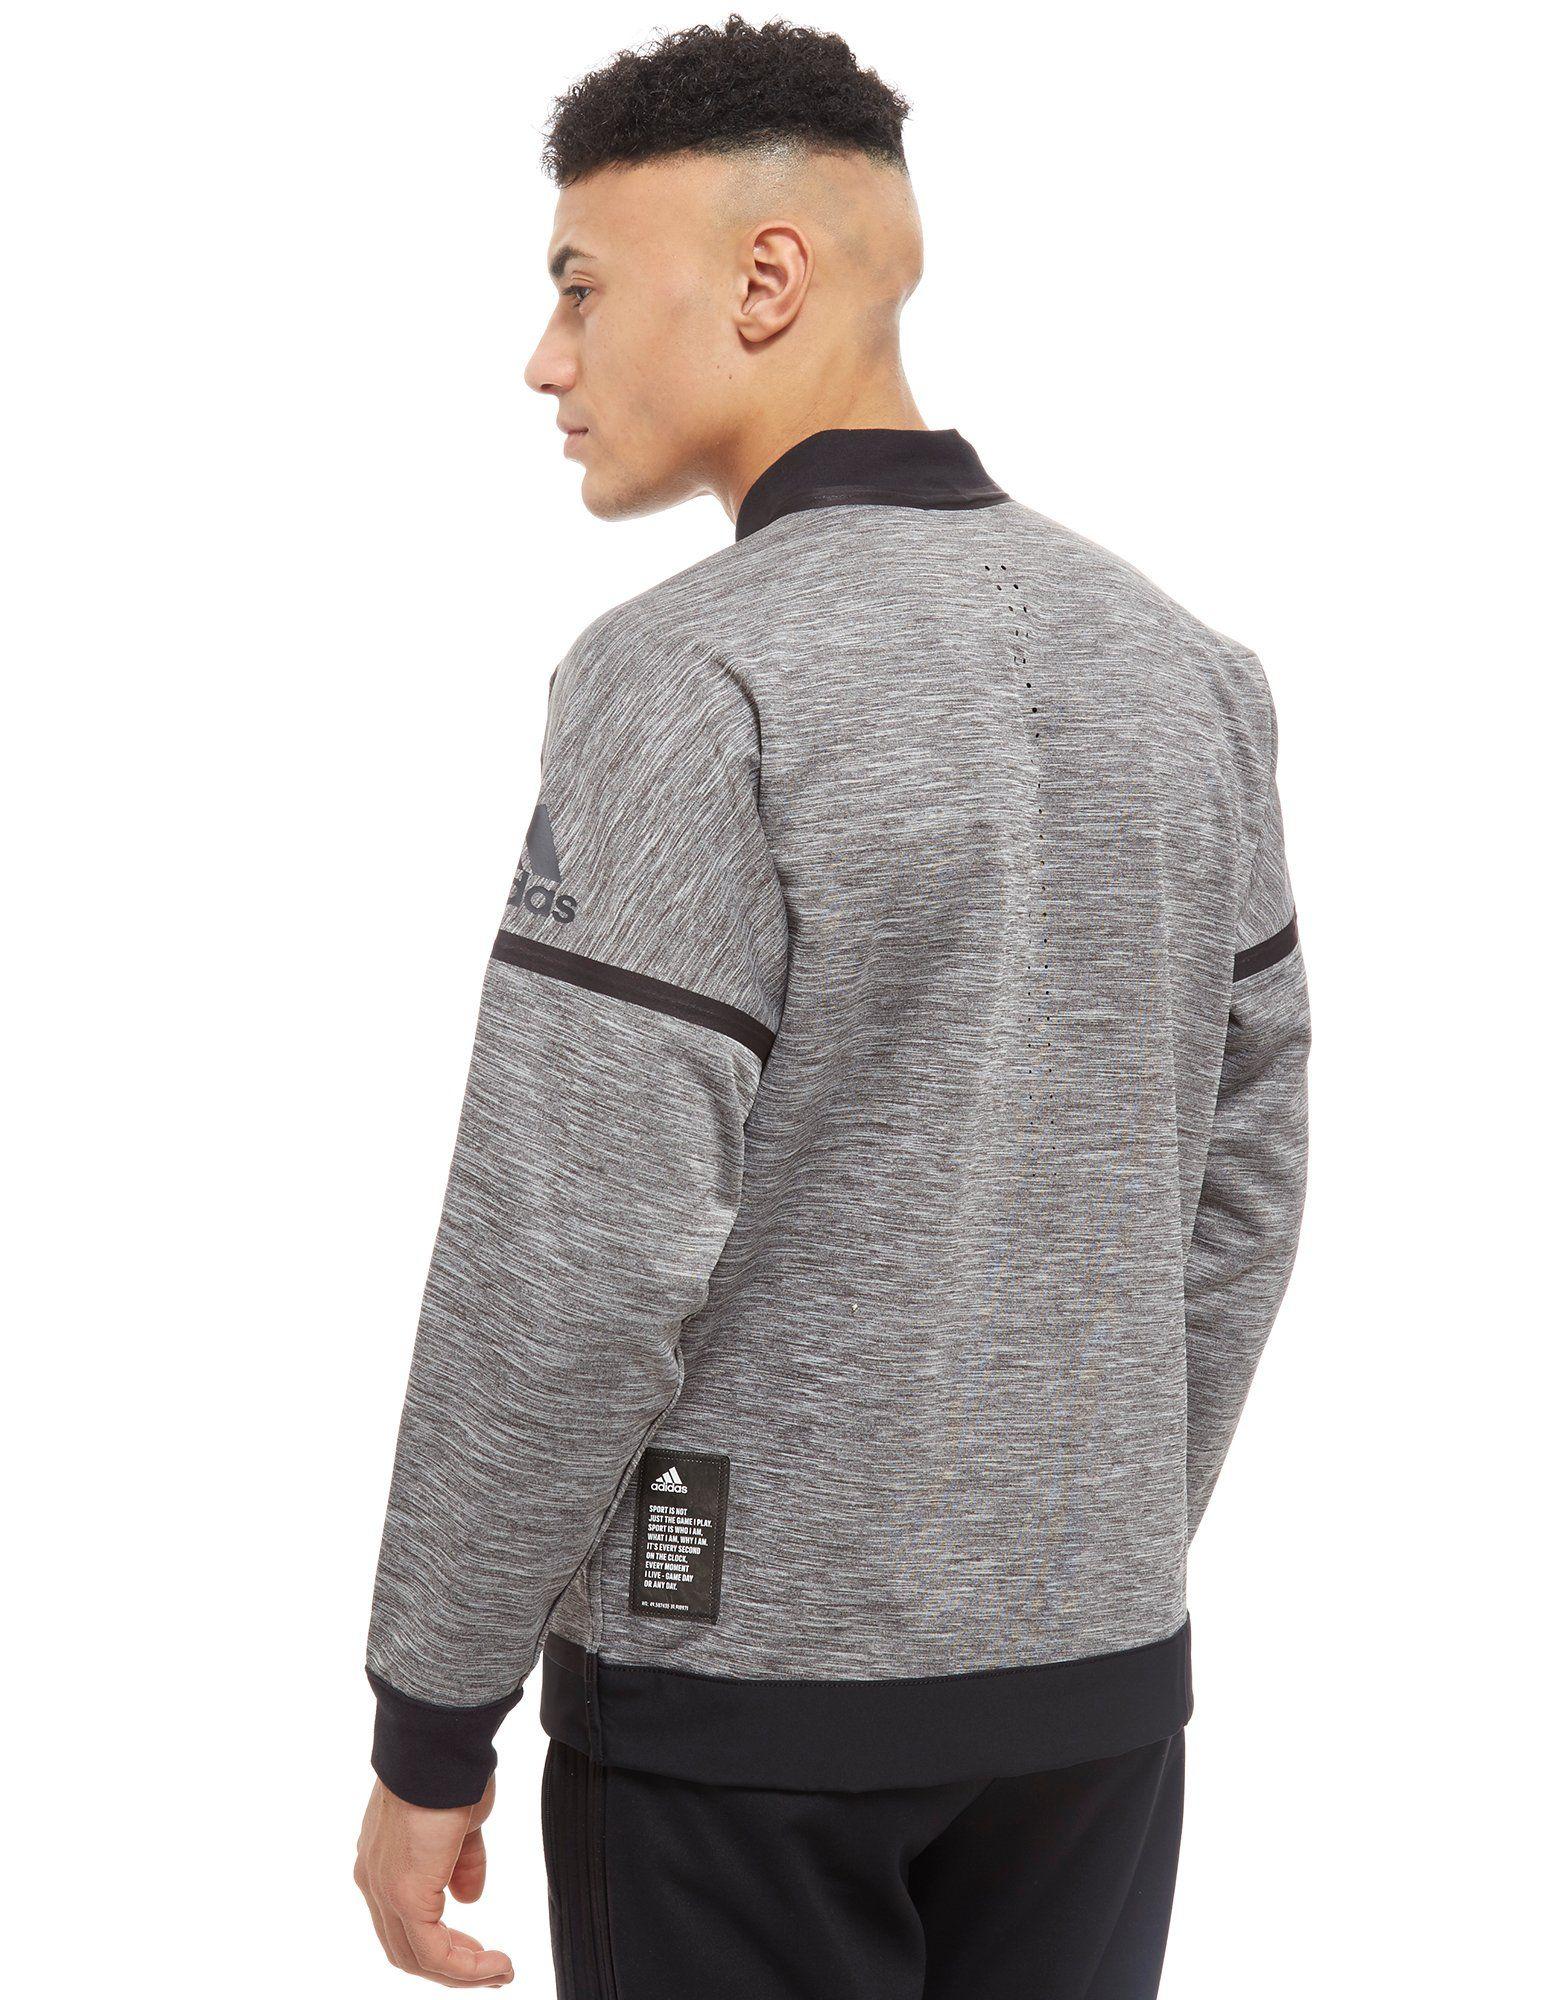 adidas Z.N.E. Track Jacket Grau